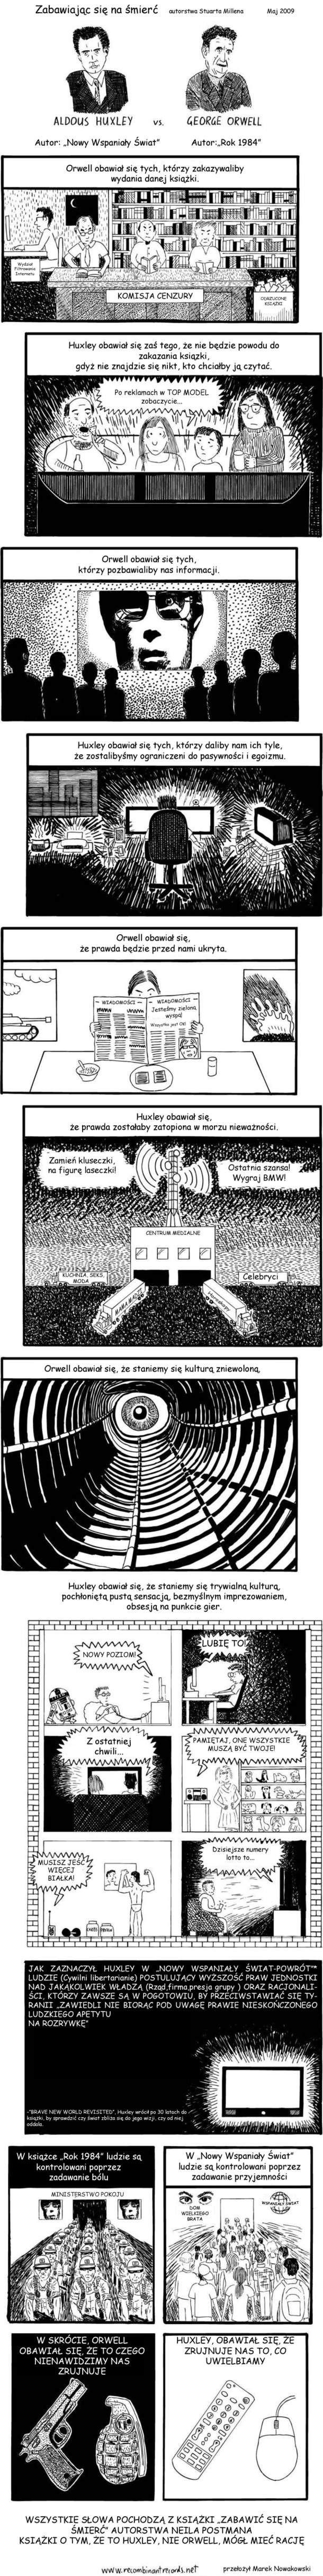 huxley-vs-orwell-pl-136543302328.jpg (610×4867)